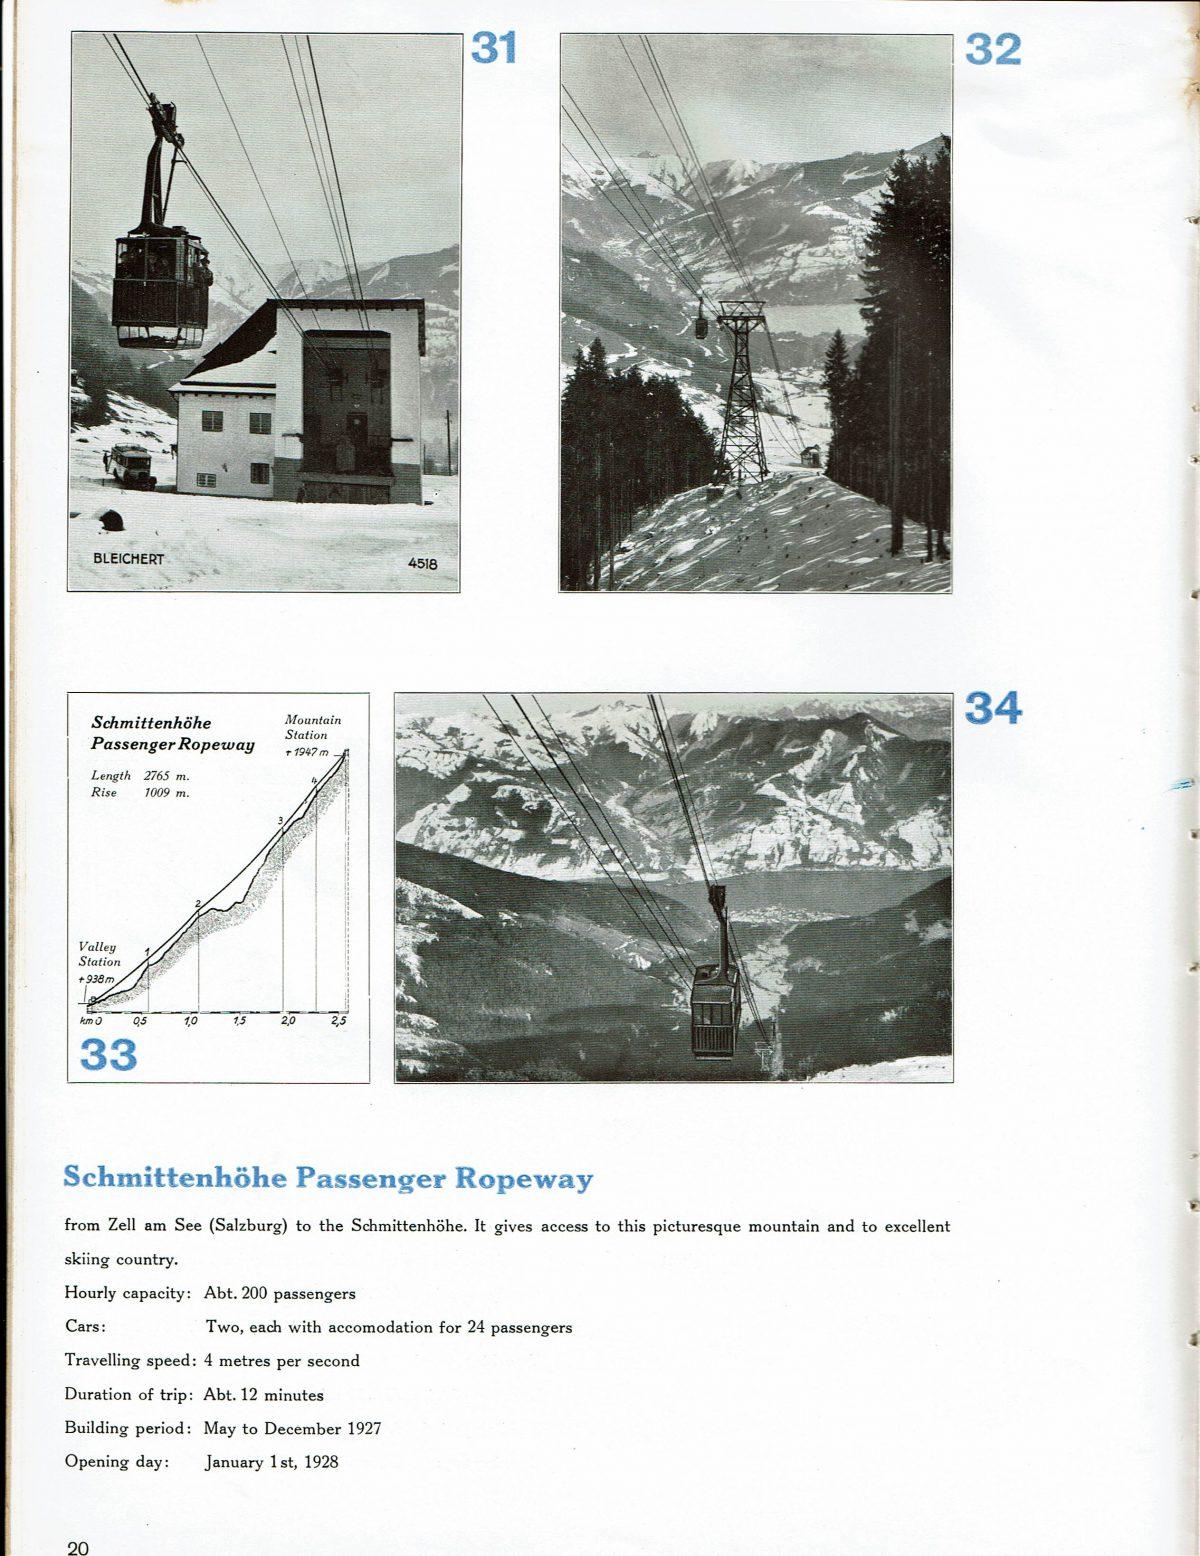 1933 Bleichert Passenger Arial Ropeways 17